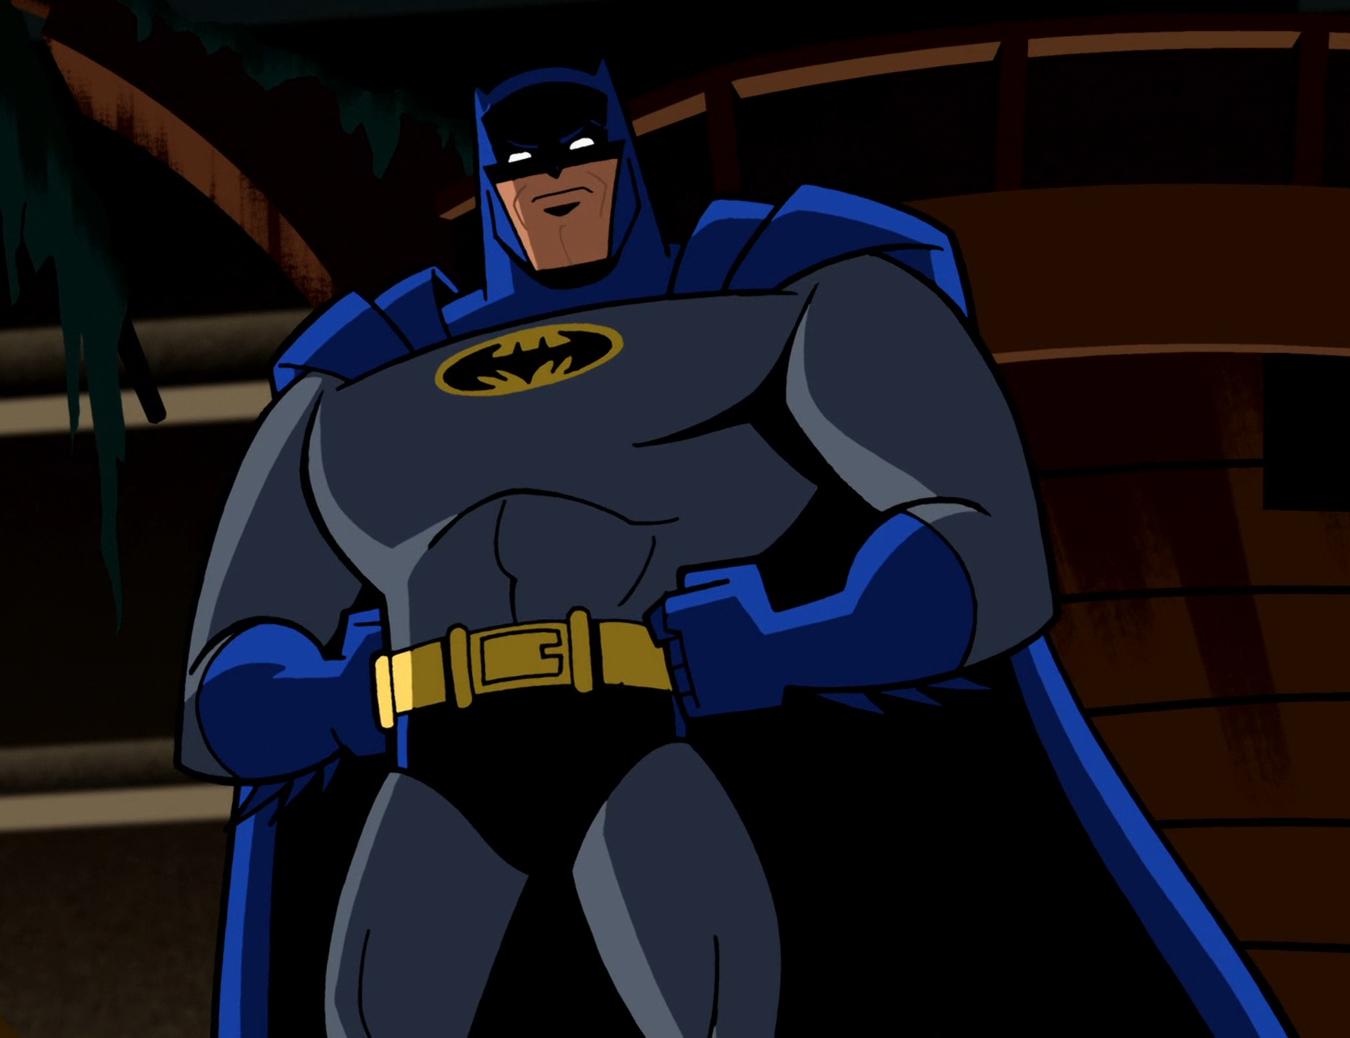 File:Bruce Wayne BTBATB 017.png